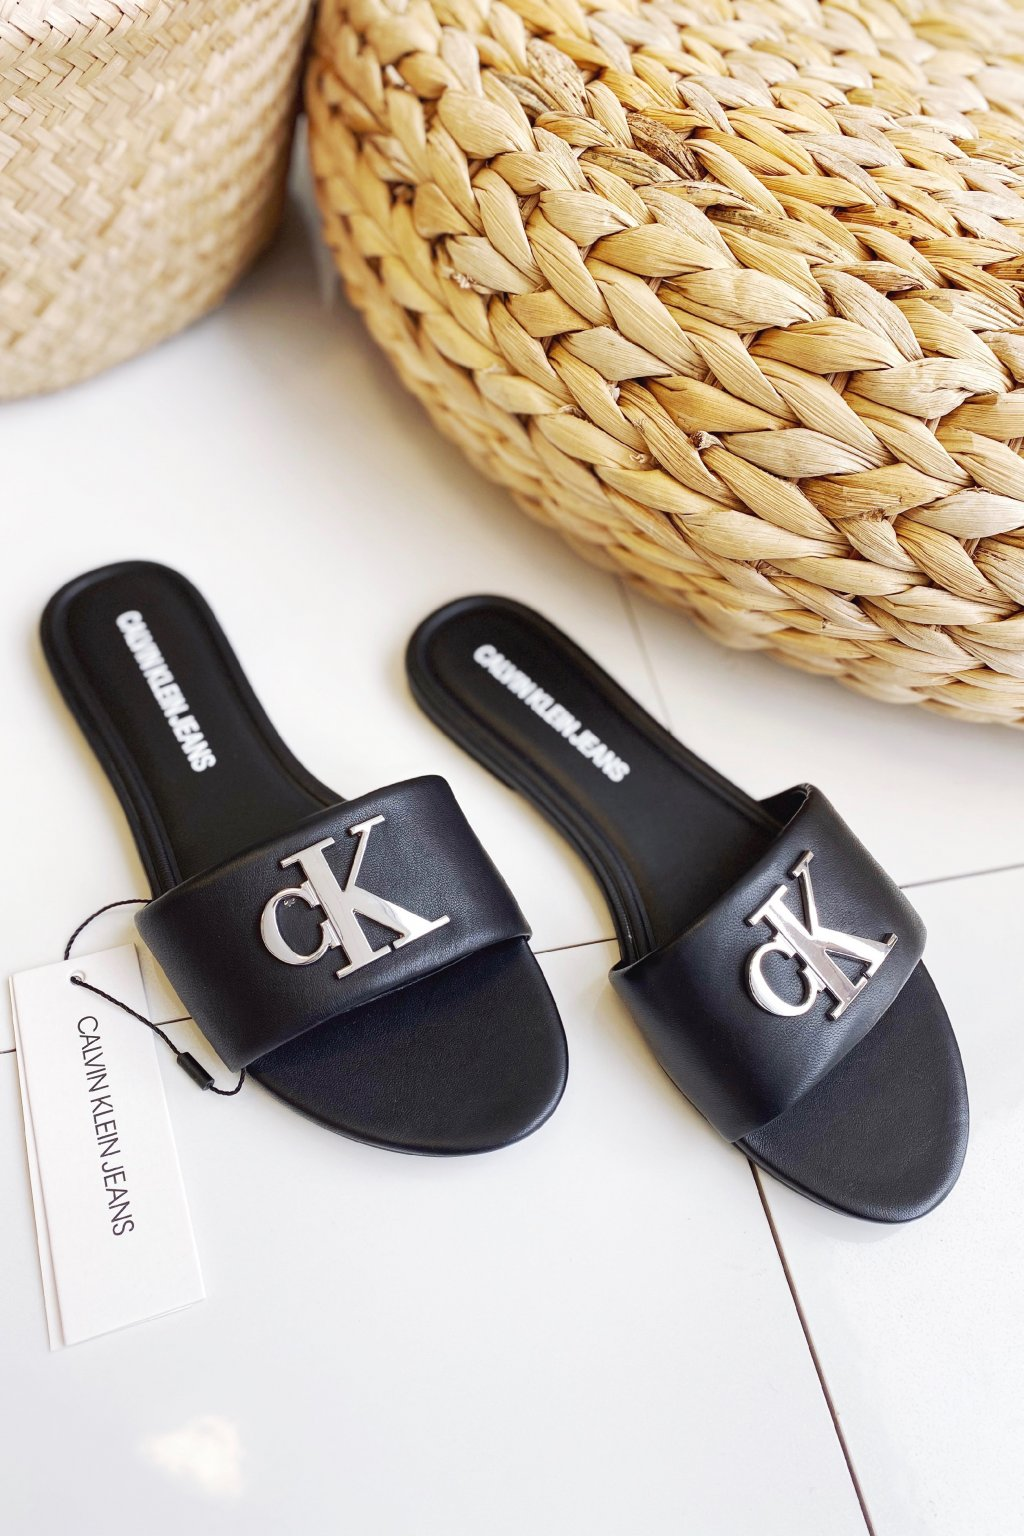 Calvin Klein Jeans pantofle dámské - černé